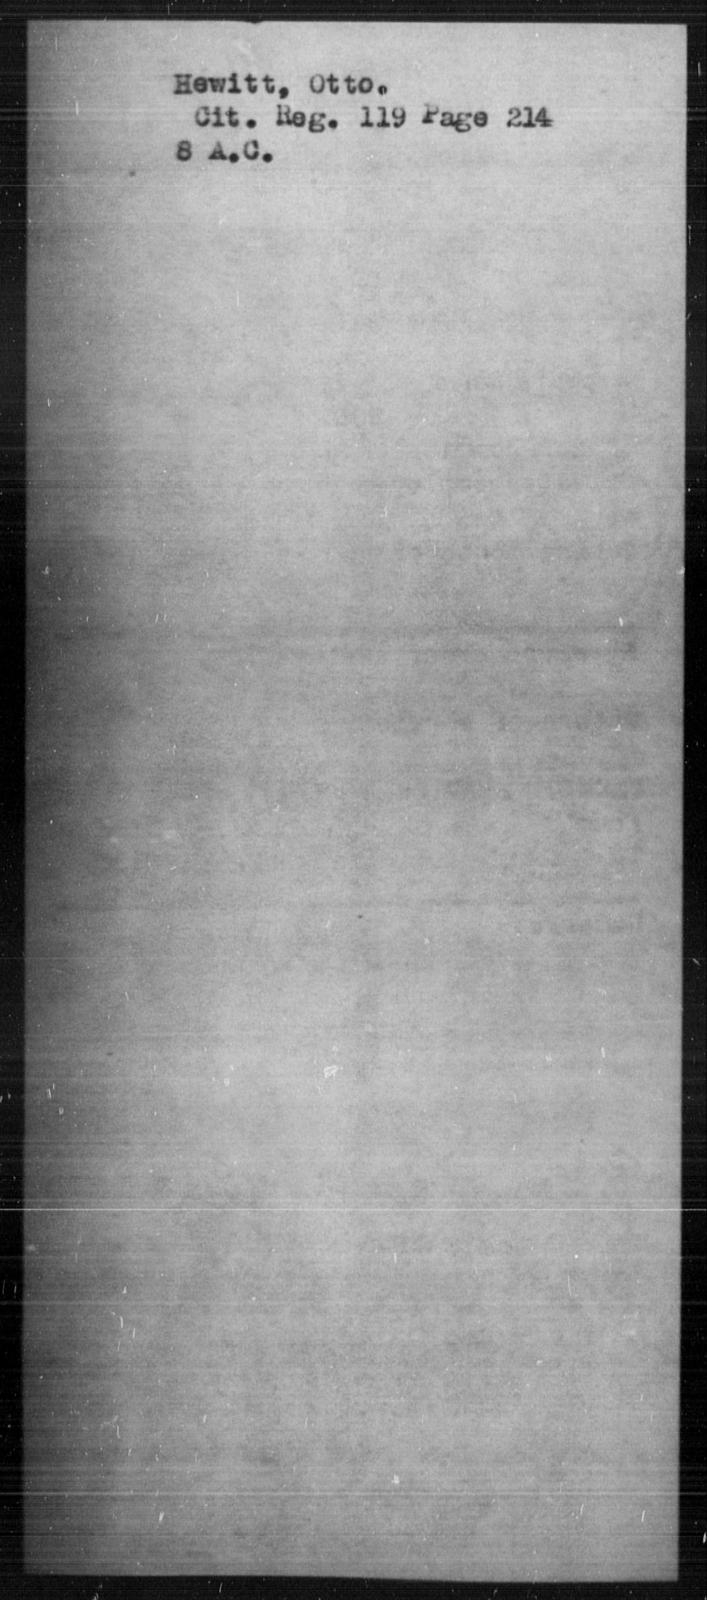 Hewitt, Otto - State: [Blank] - Year: [Blank]